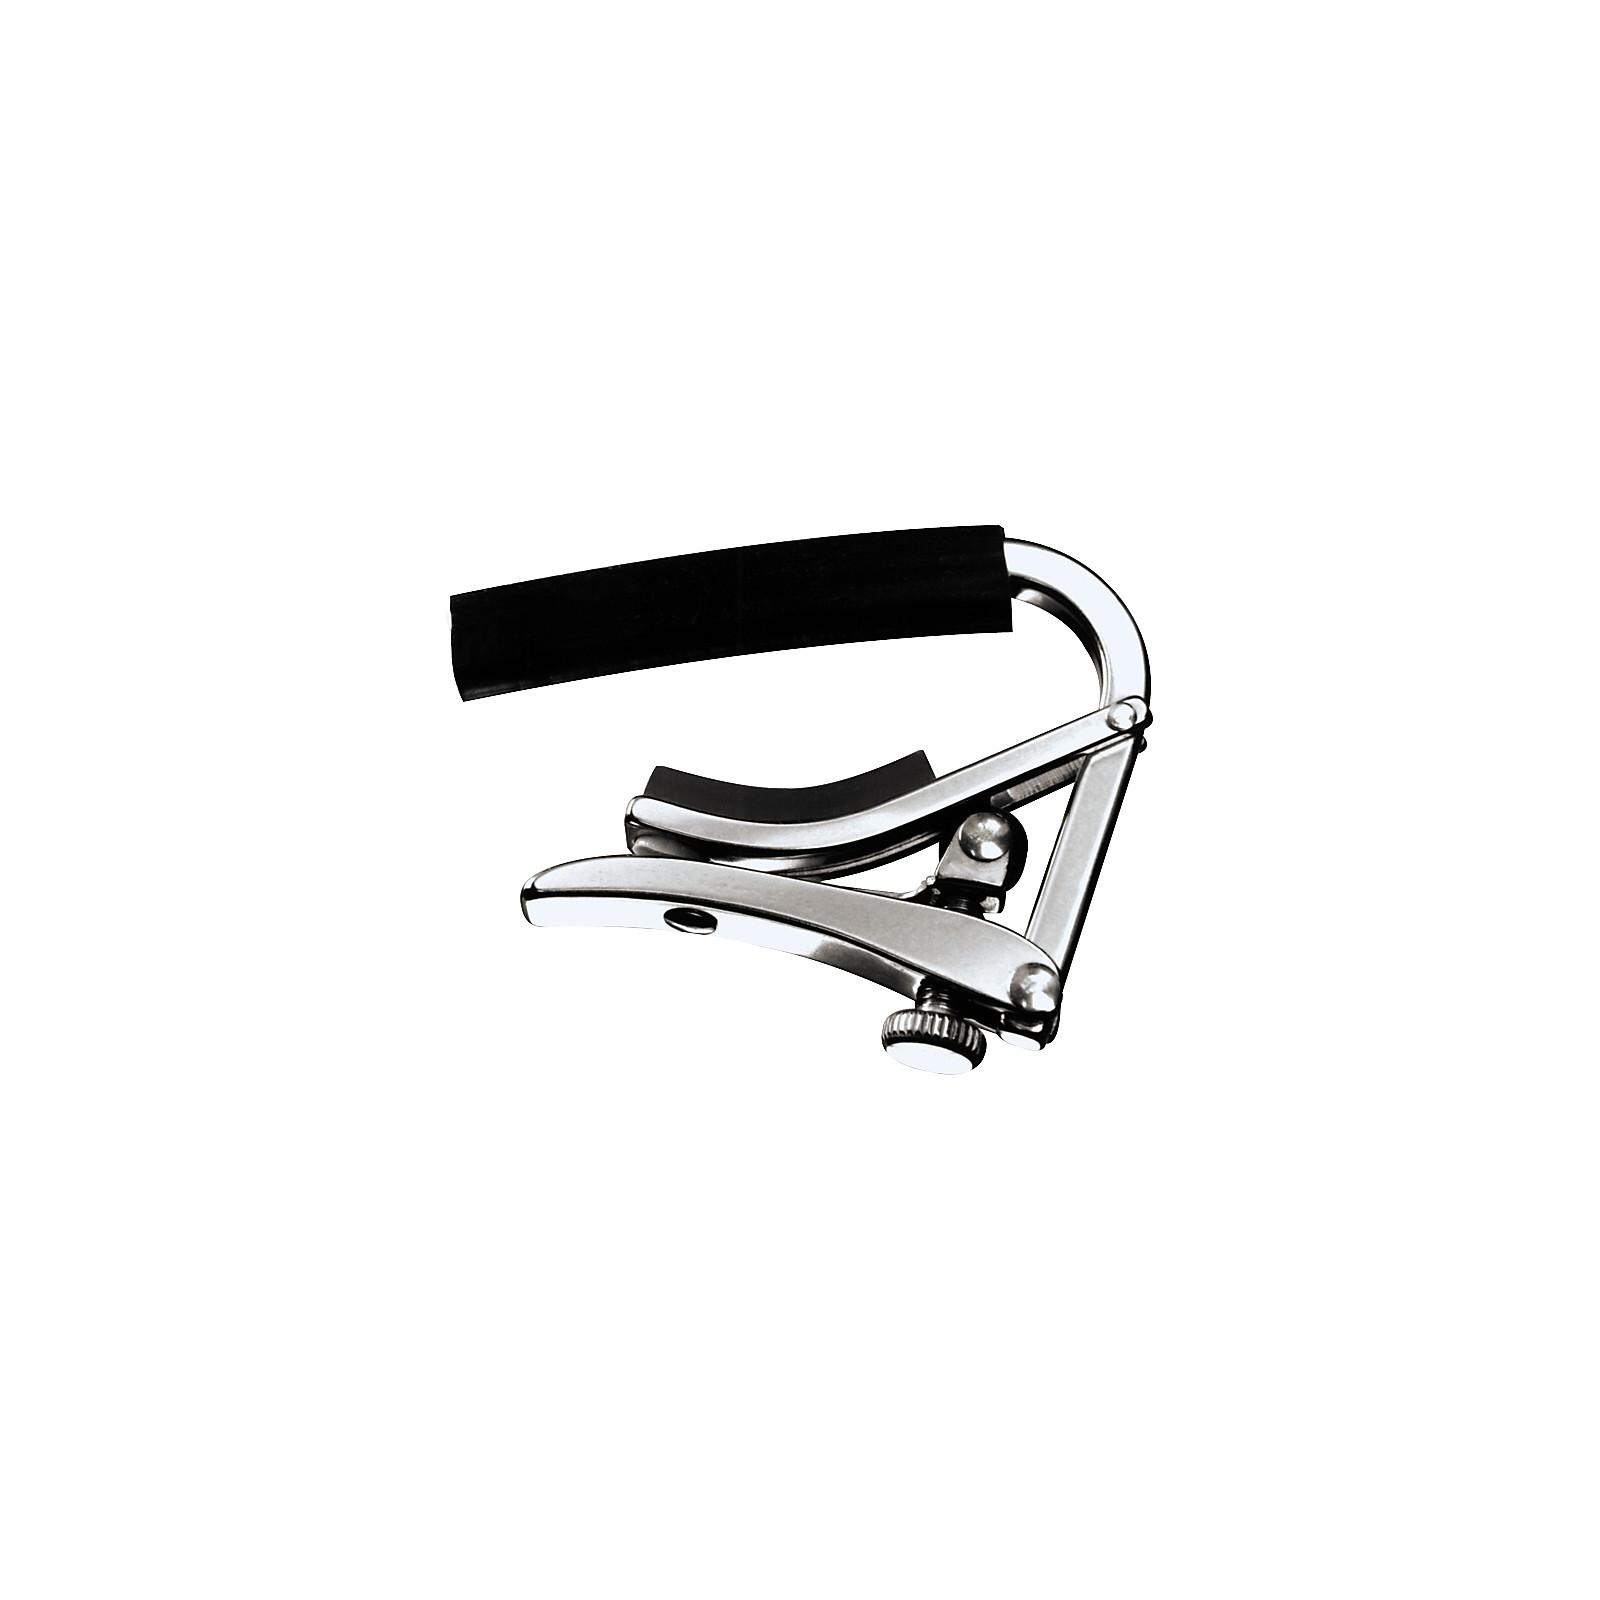 Shubb Deluxe S Series Steel String Capo